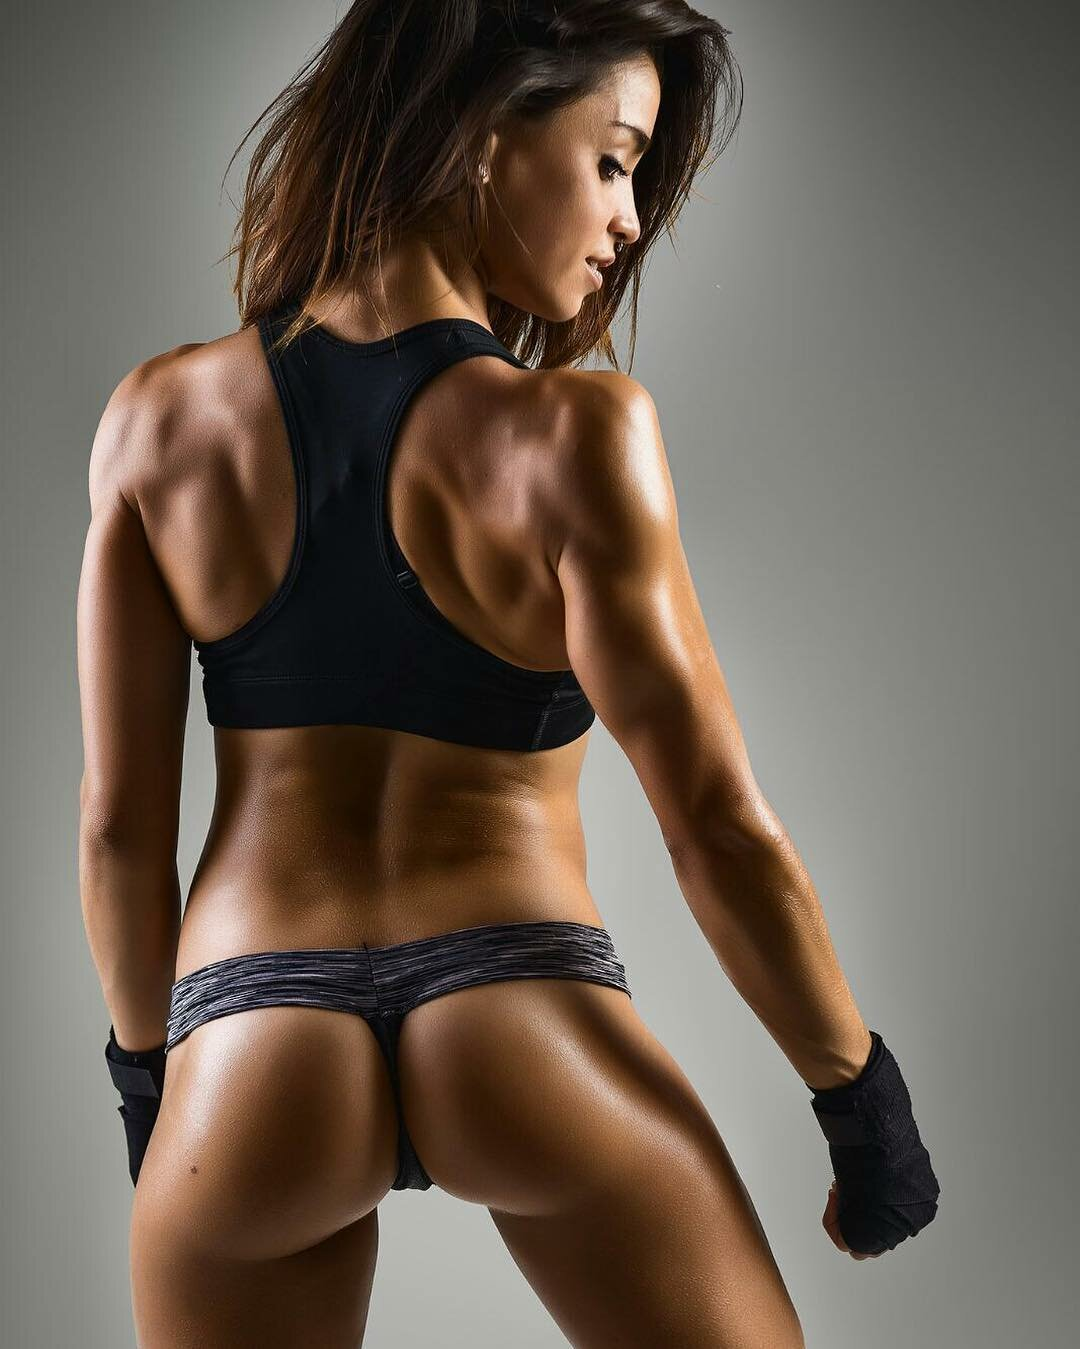 Спортивное тело в картинках